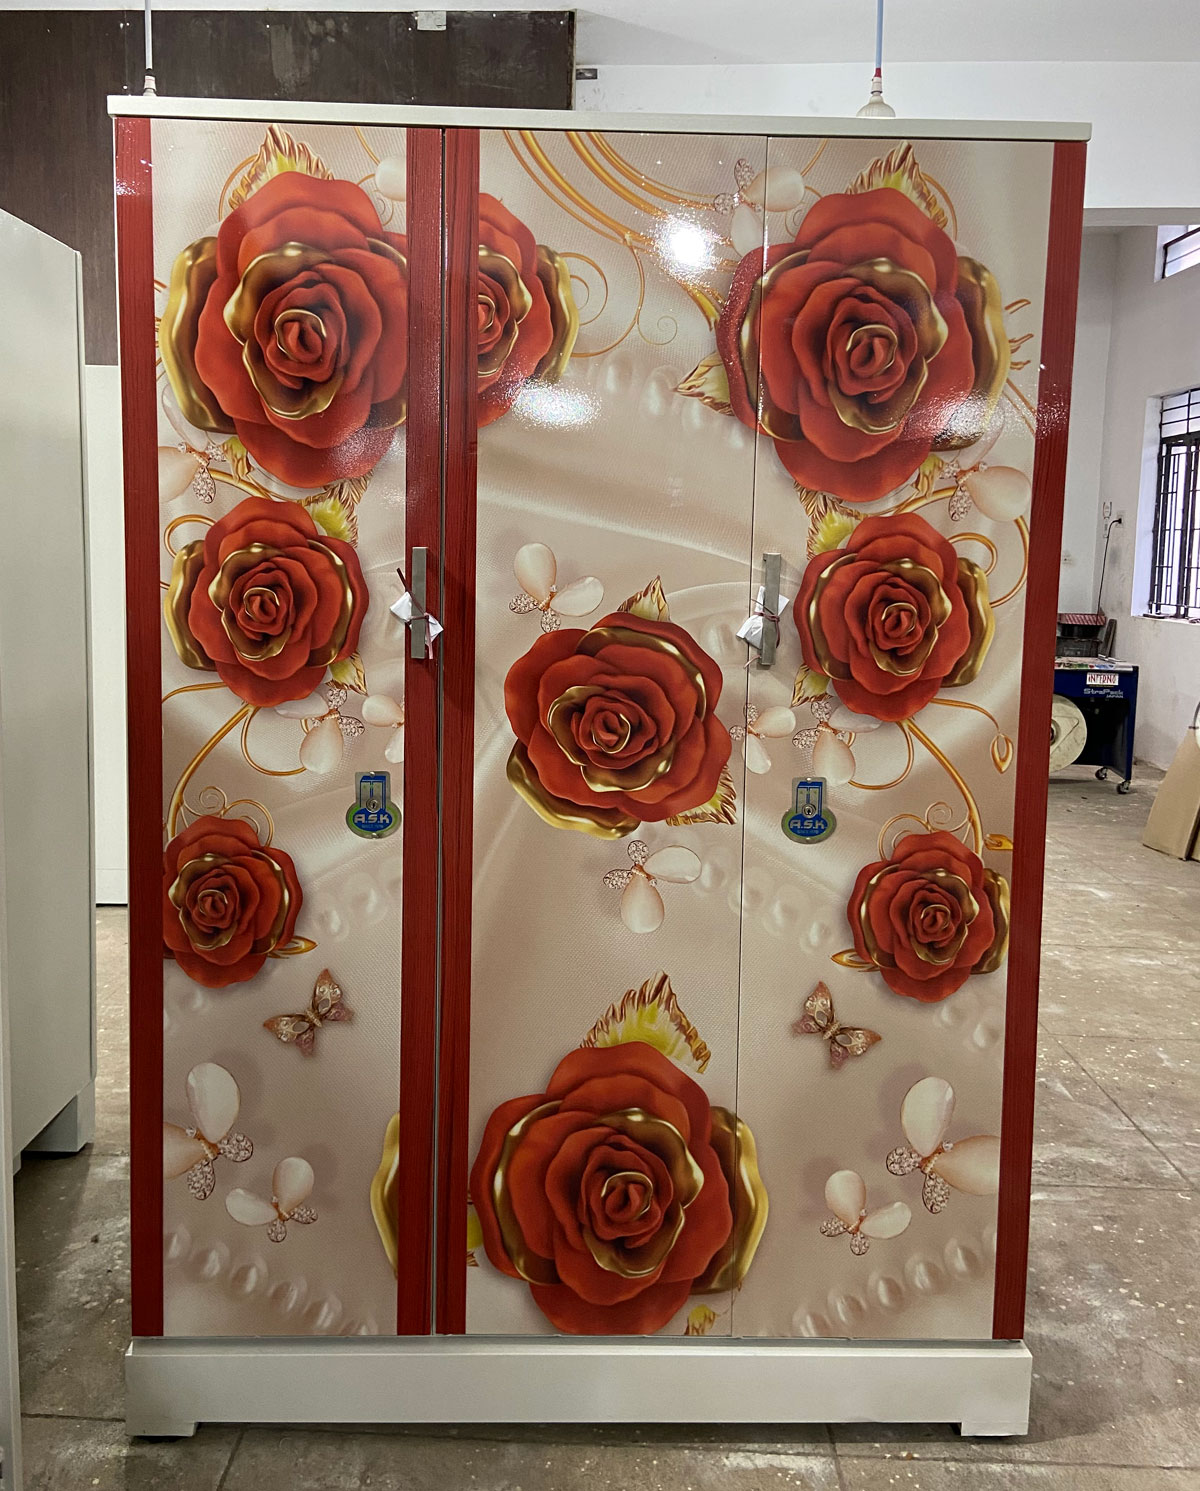 digital uv printed steel bero 3 door almirah red roses pearls